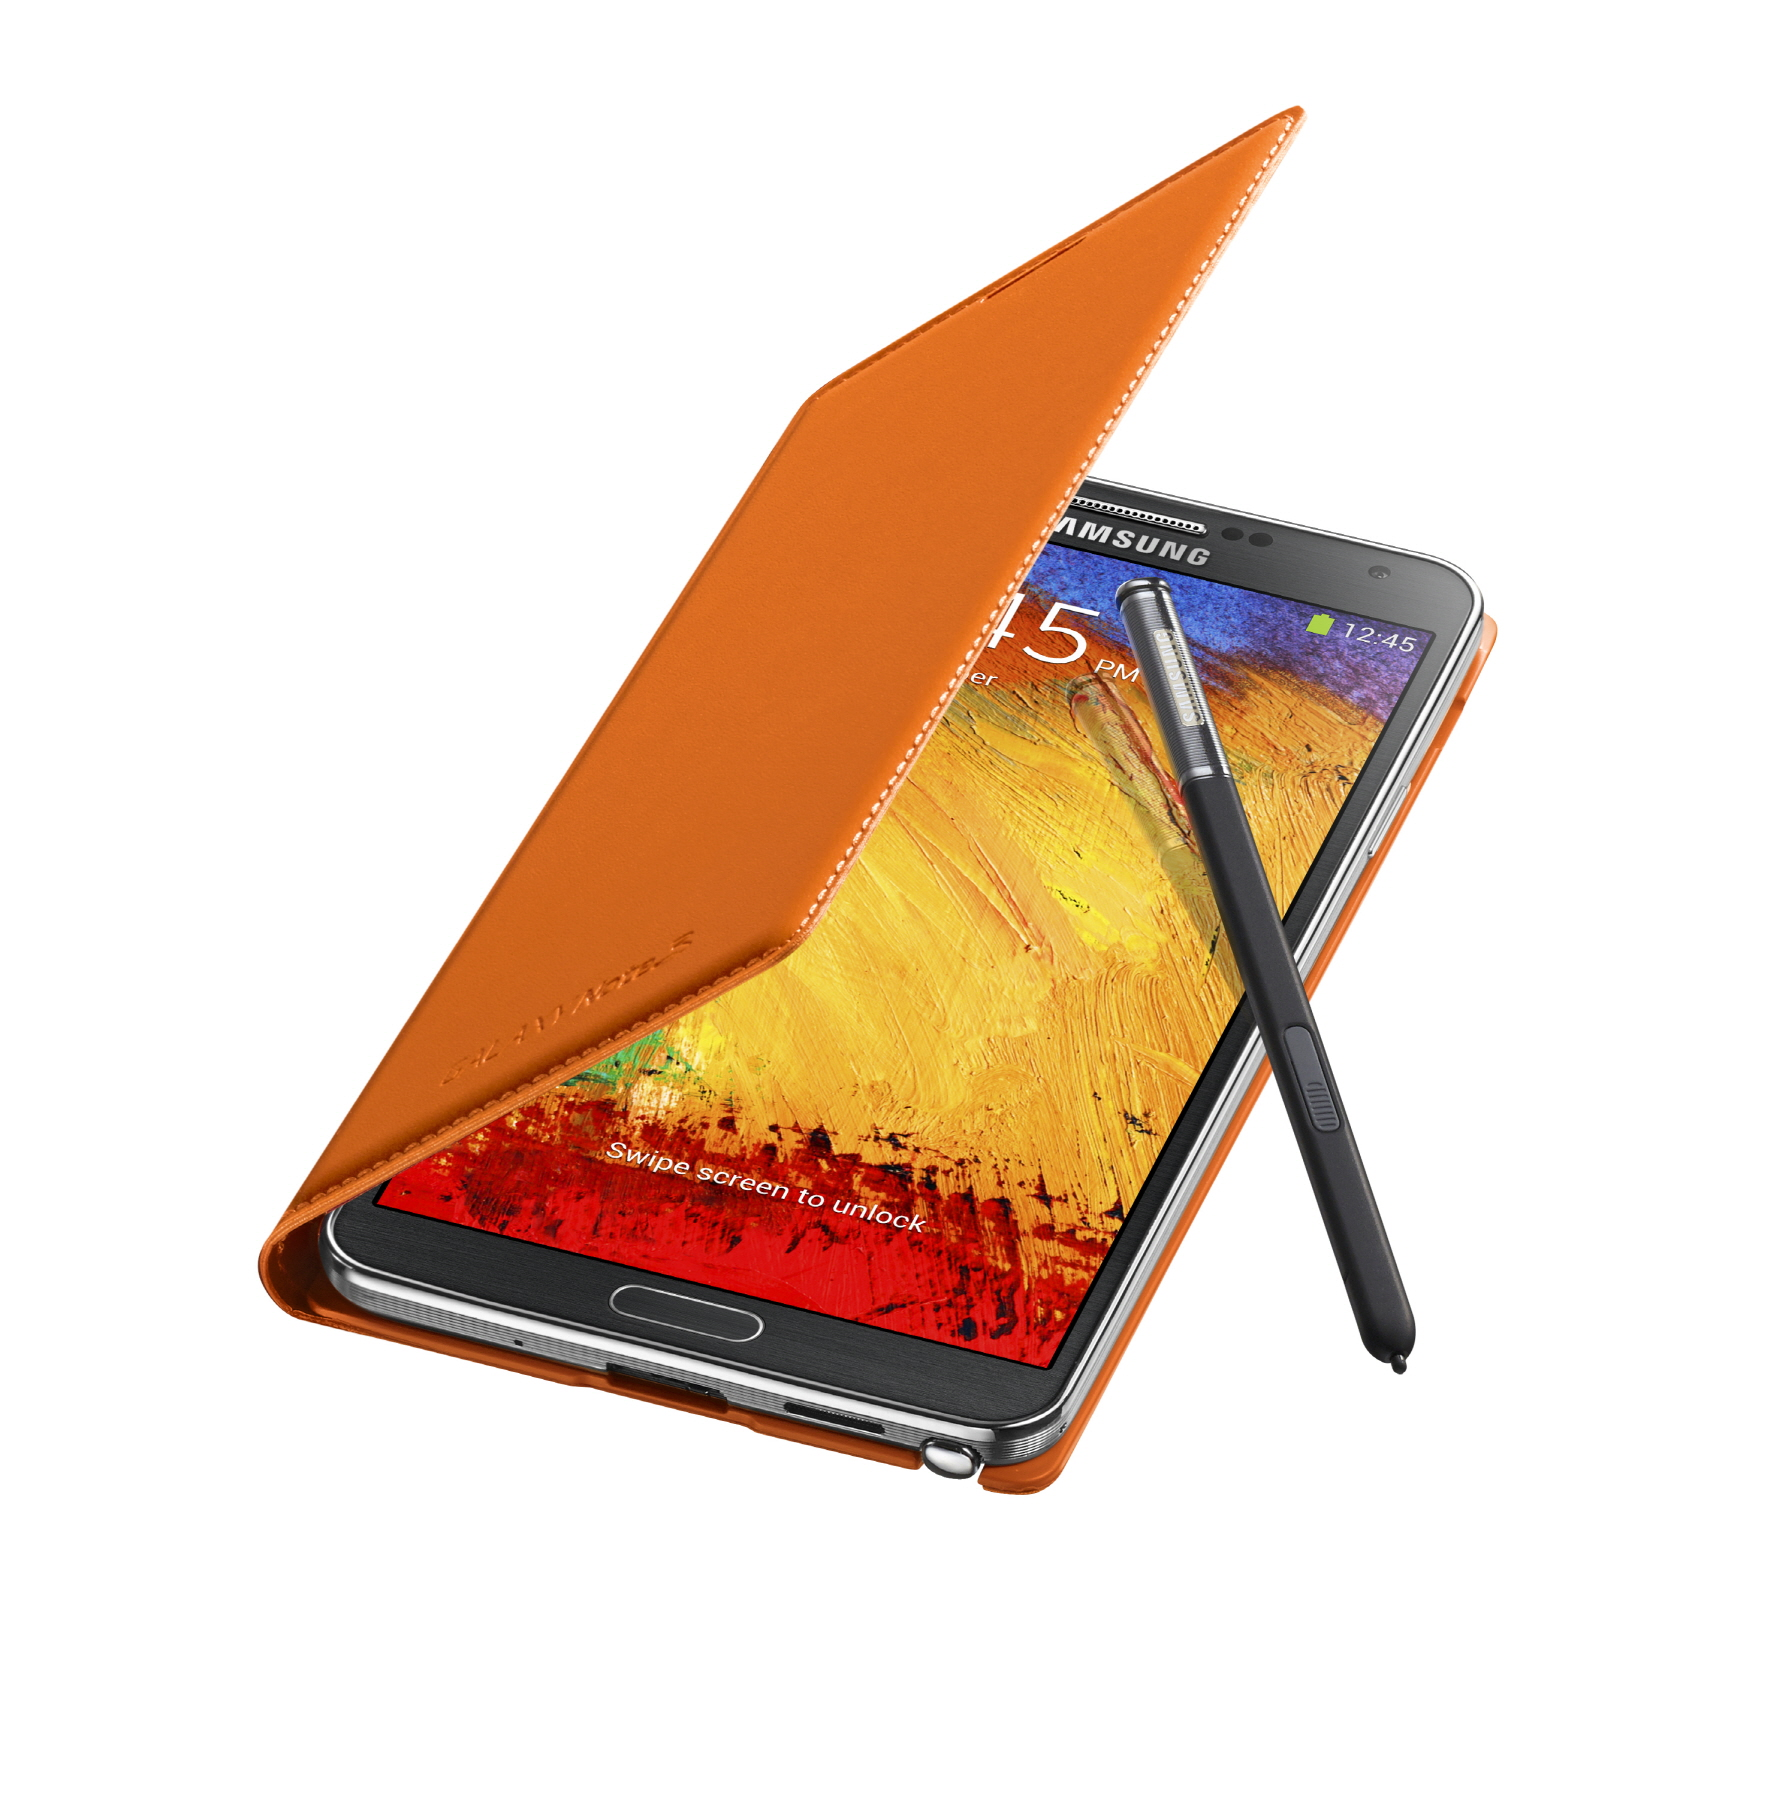 Galaxy Note3 FlipCover_004_Open Pen_Wild Orange